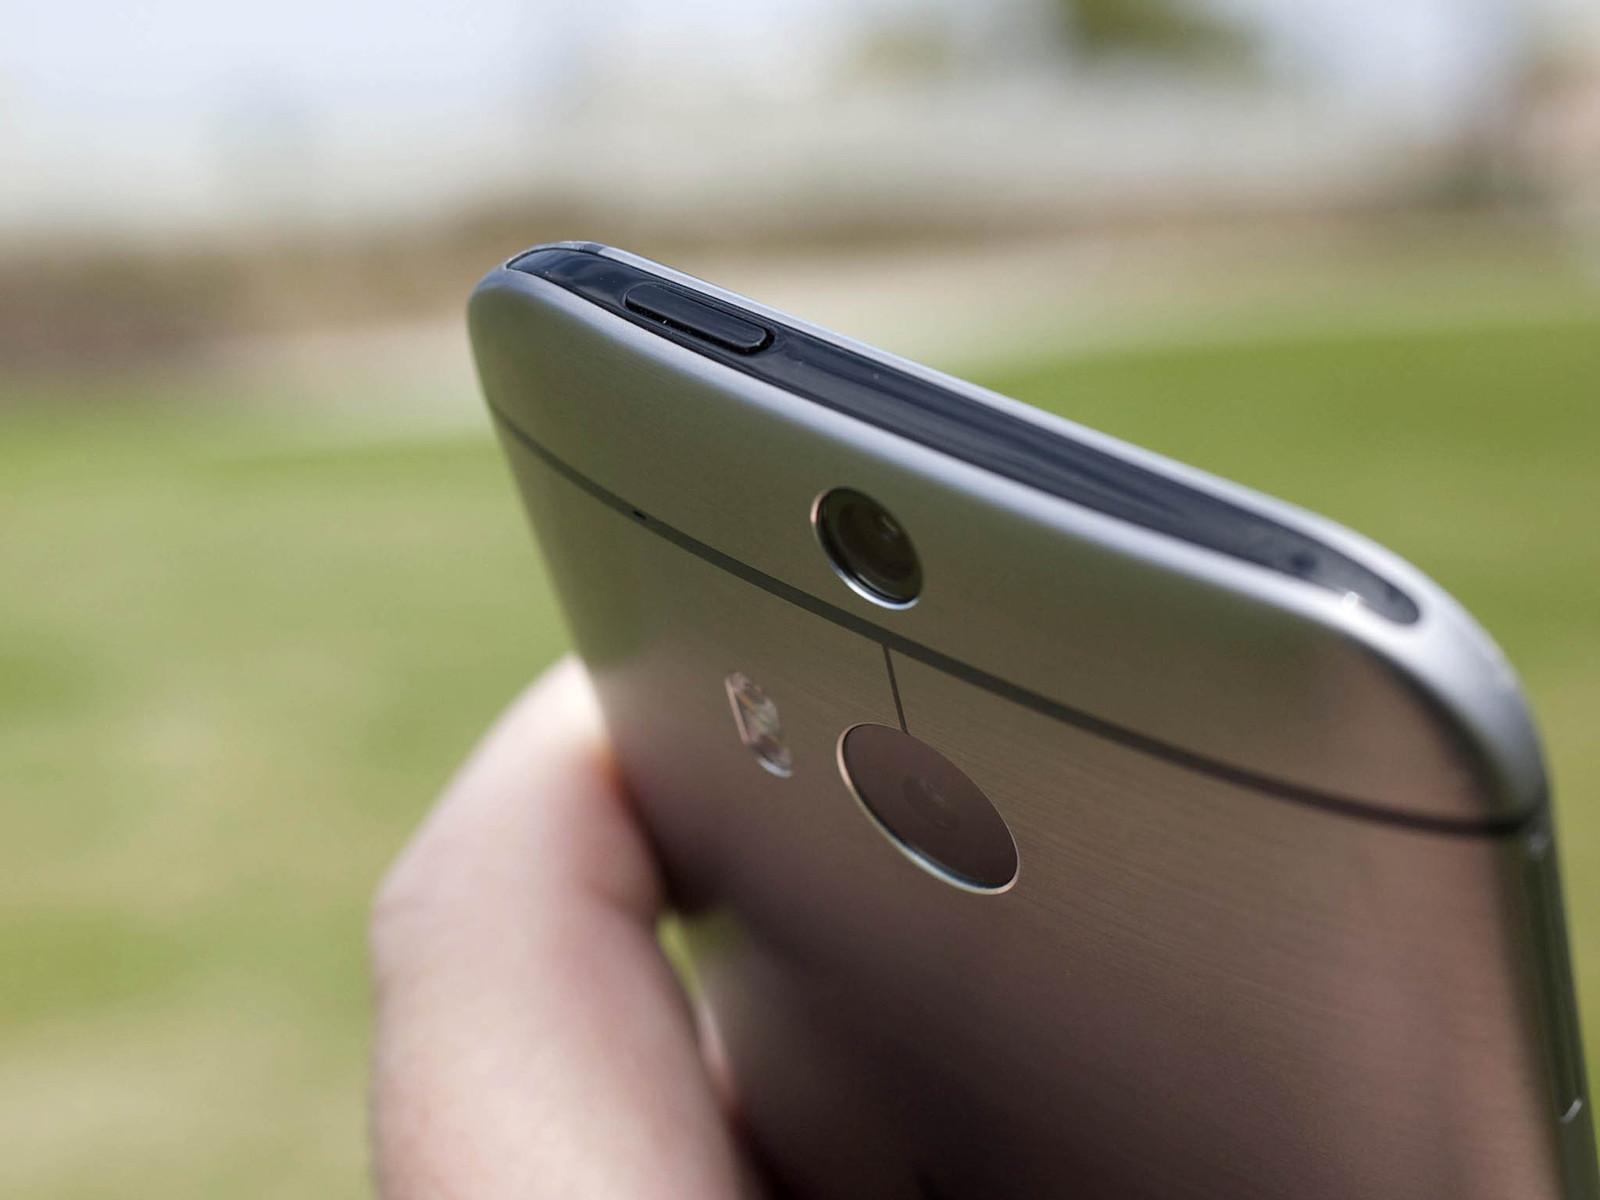 HTC One M8, design